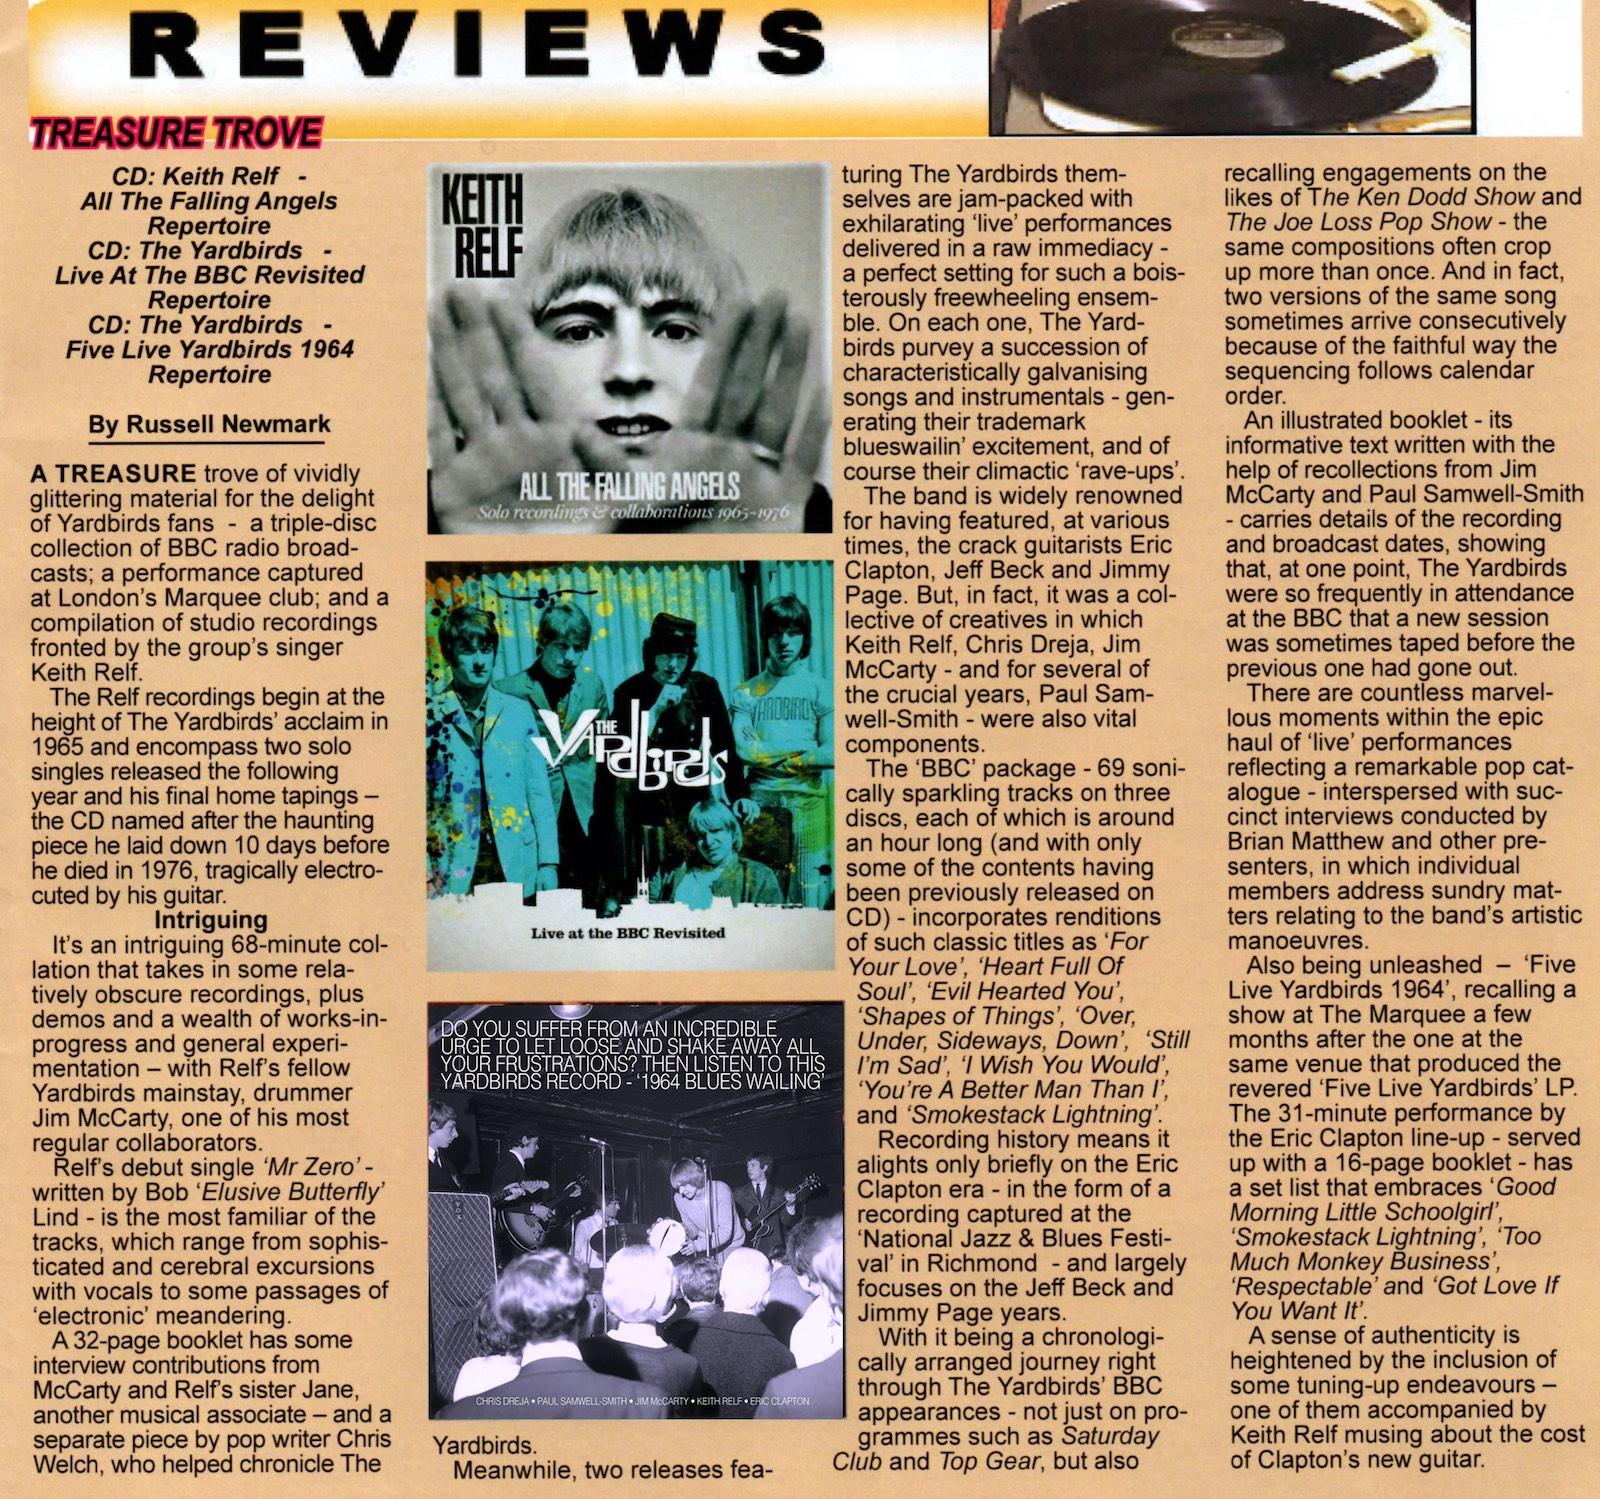 Beat Magazine - Review